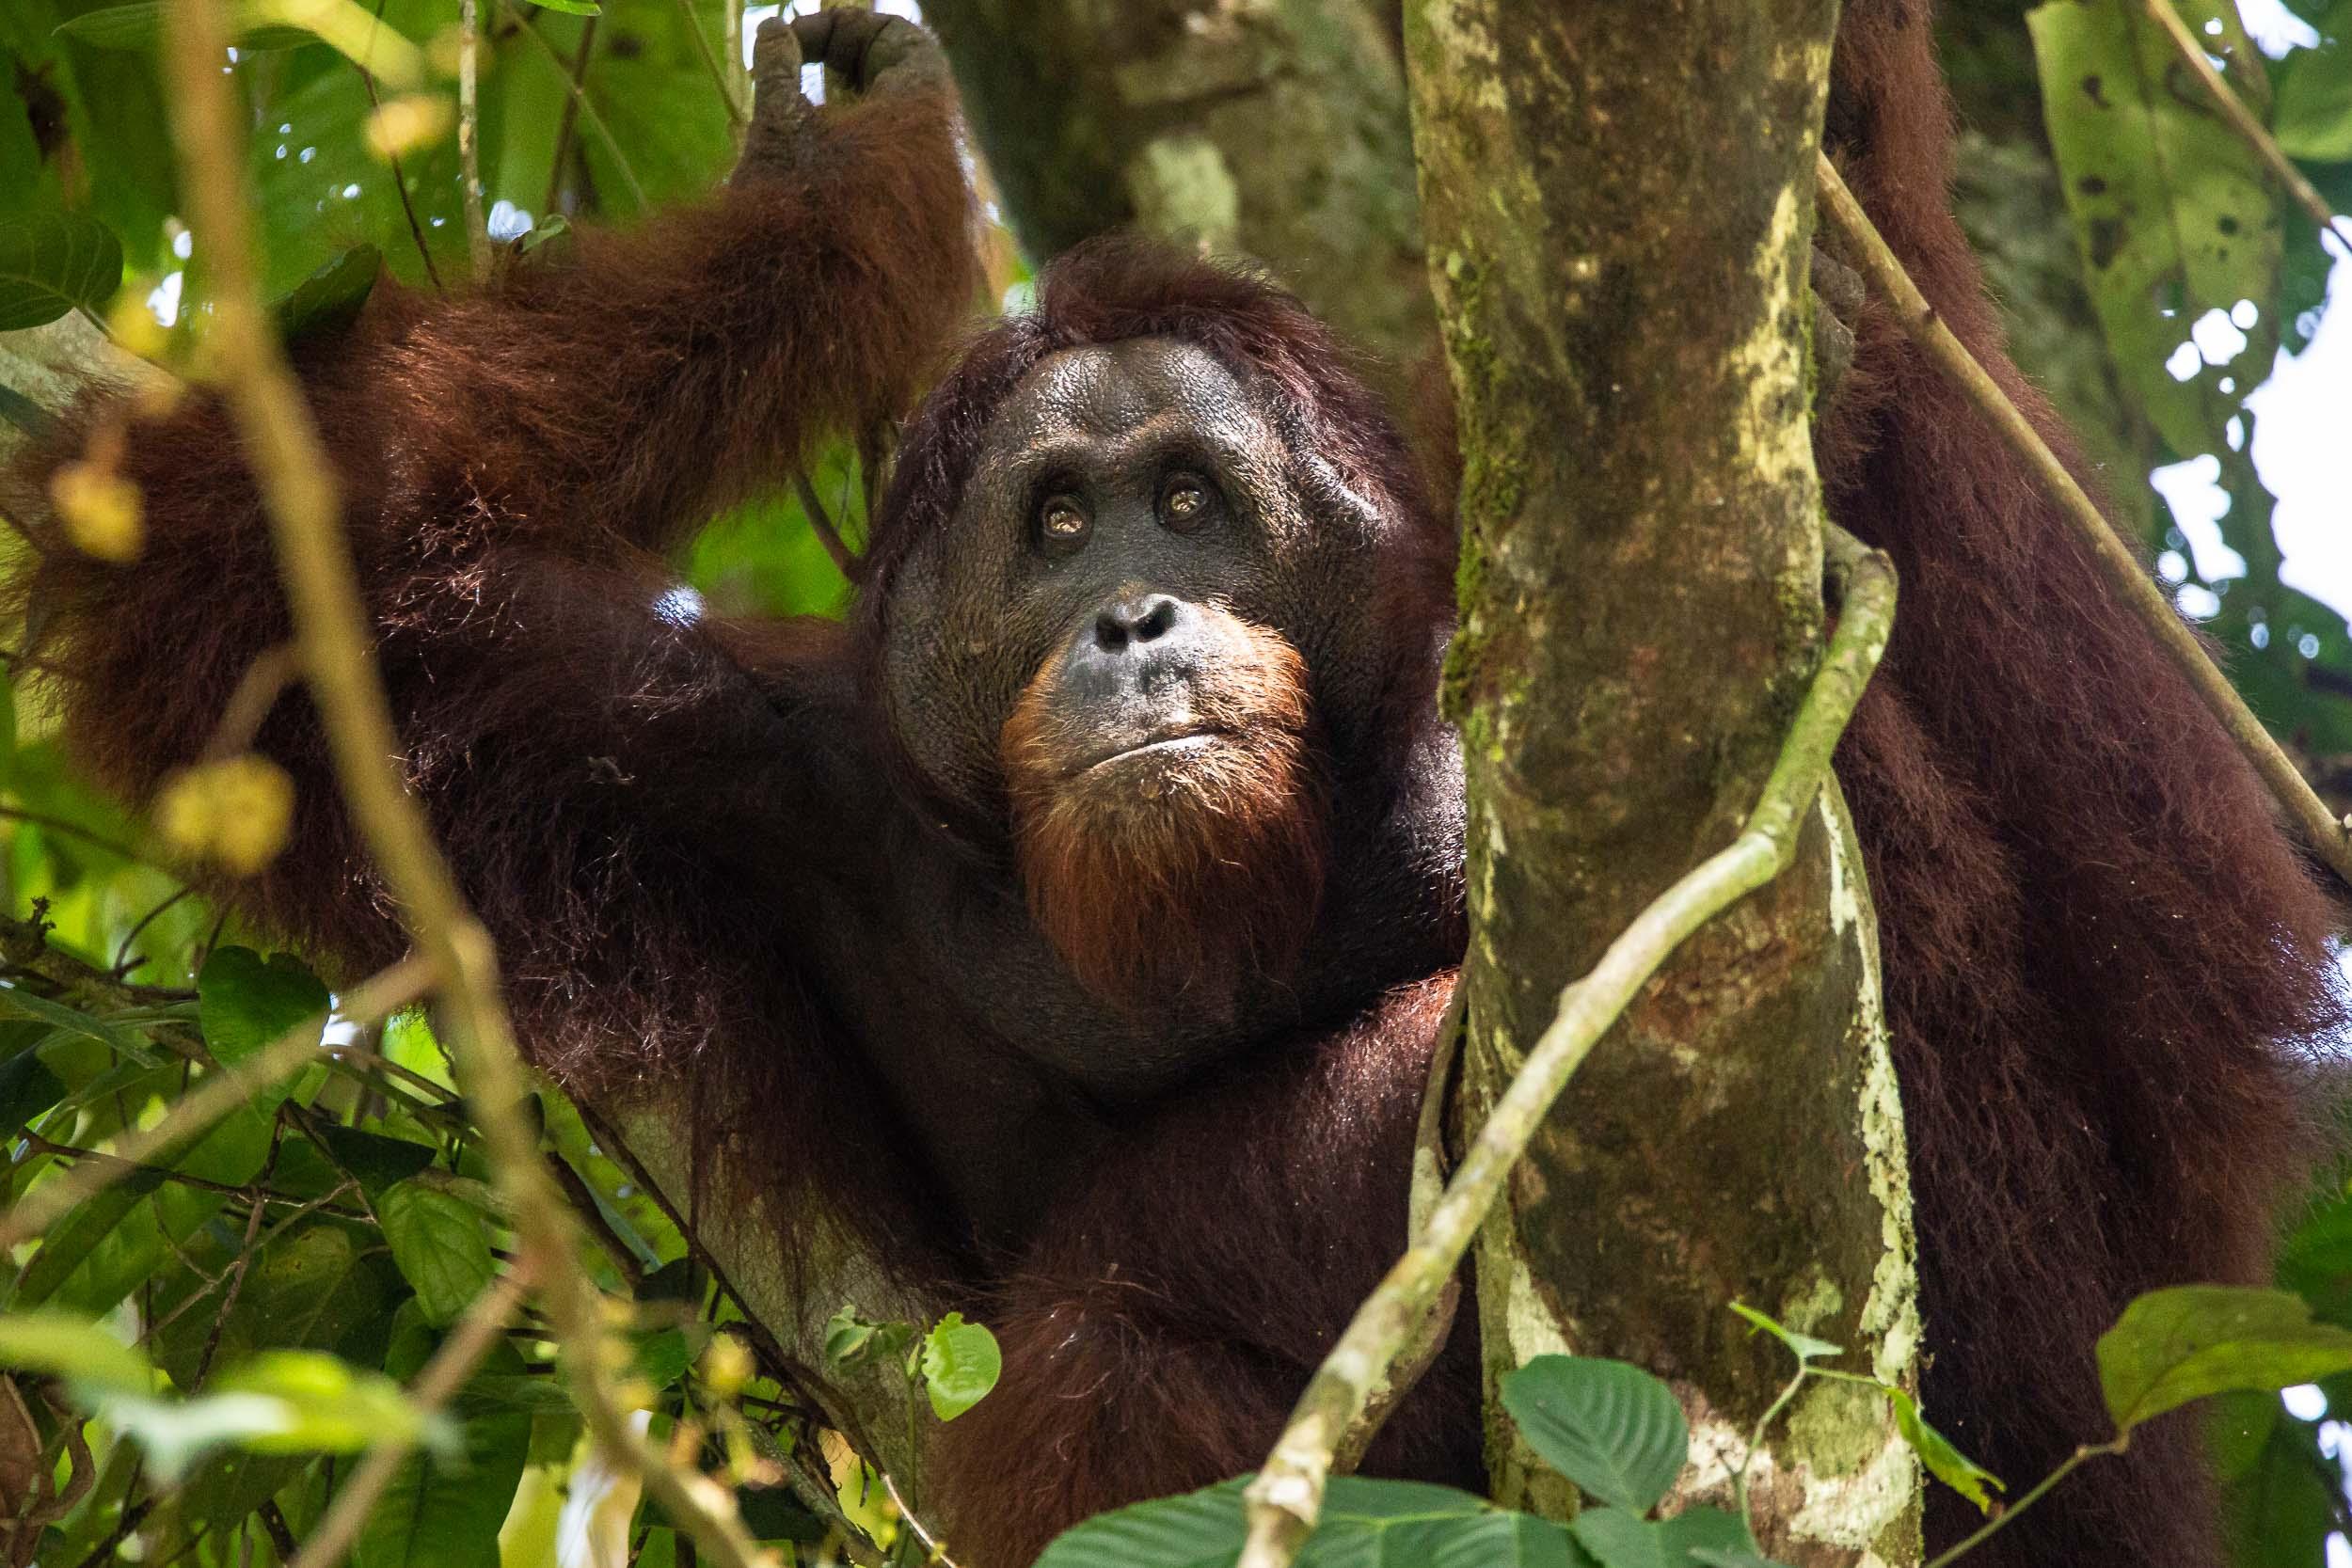 Large Male Orangutan with Flanged Cheeks in a tree, Danum Valley, Sabah, Borneo, Malaysia.jpg